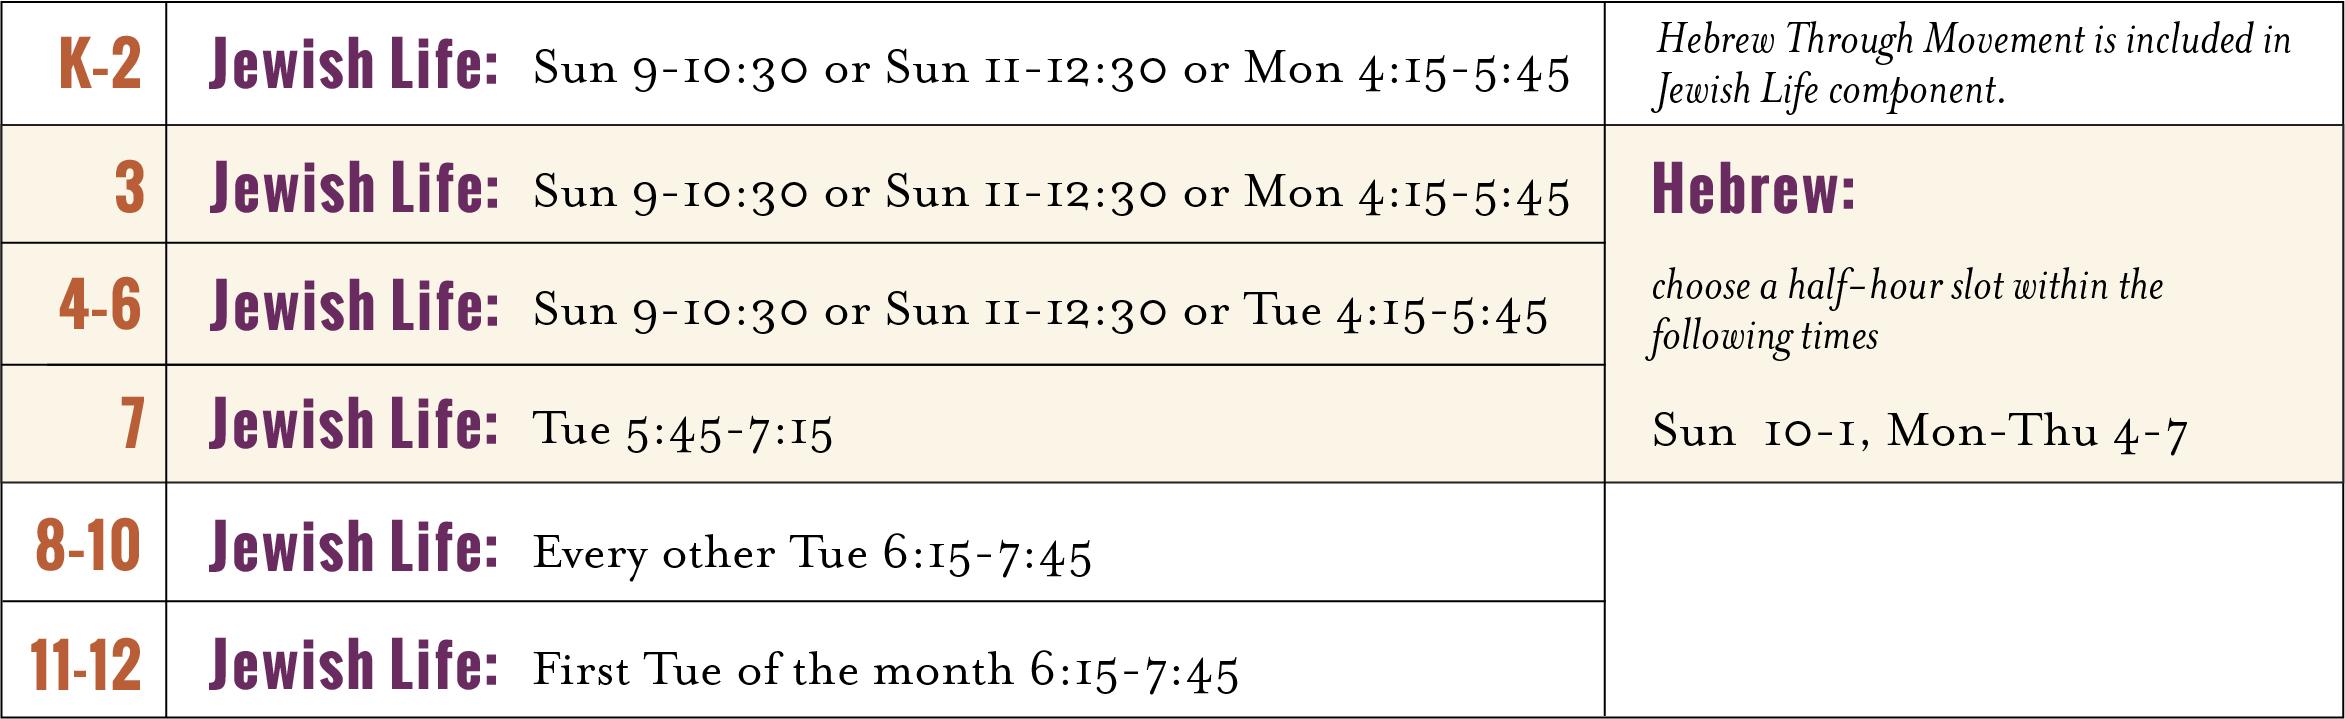 Kesher 21-22 Schedule-v2